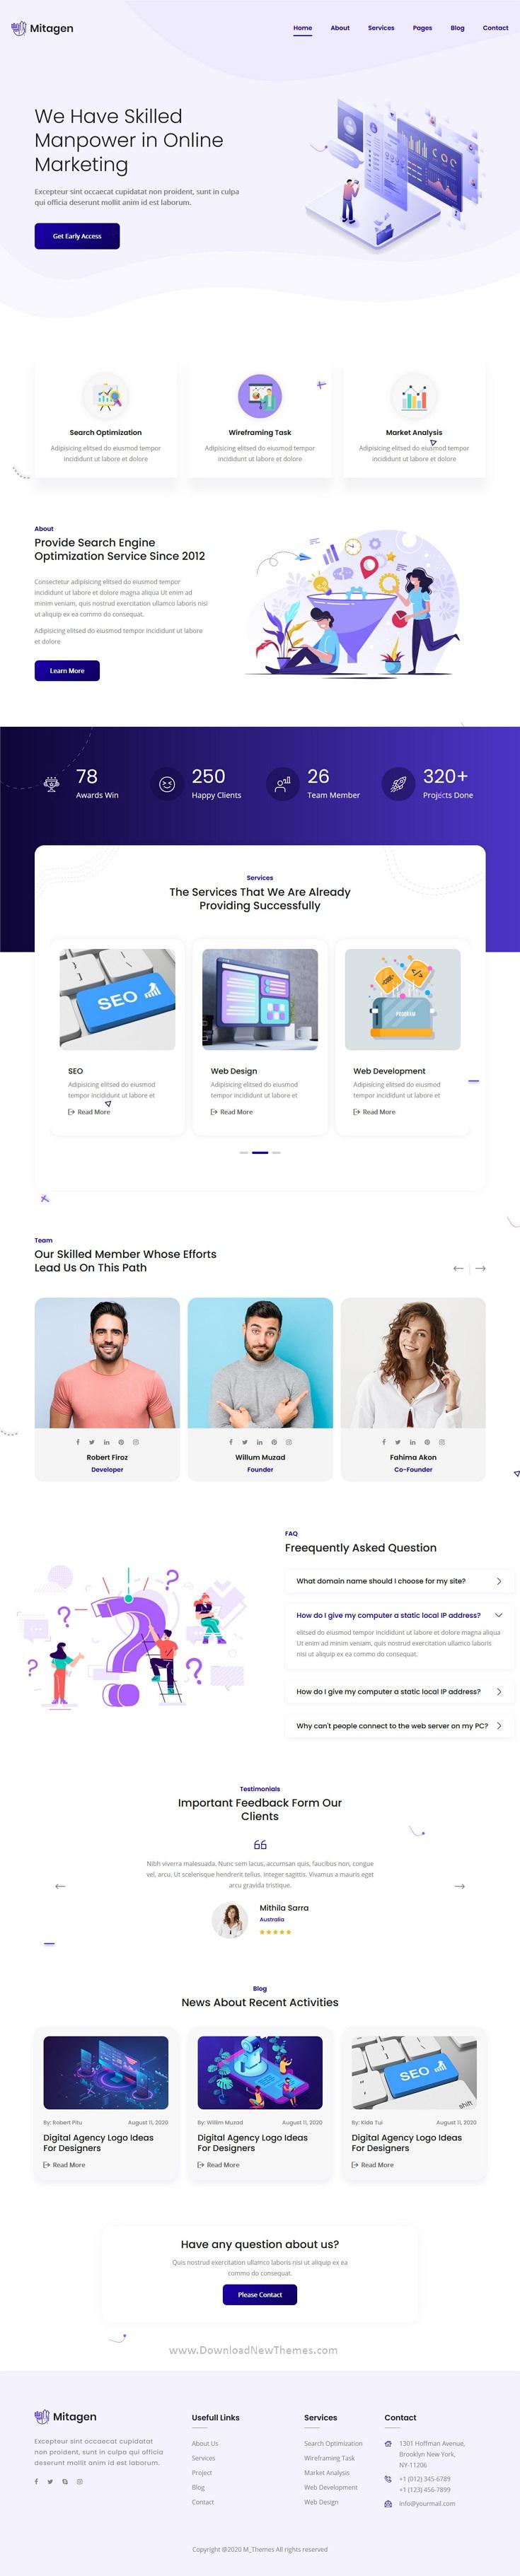 SEO / Marketing Agency HTML Template